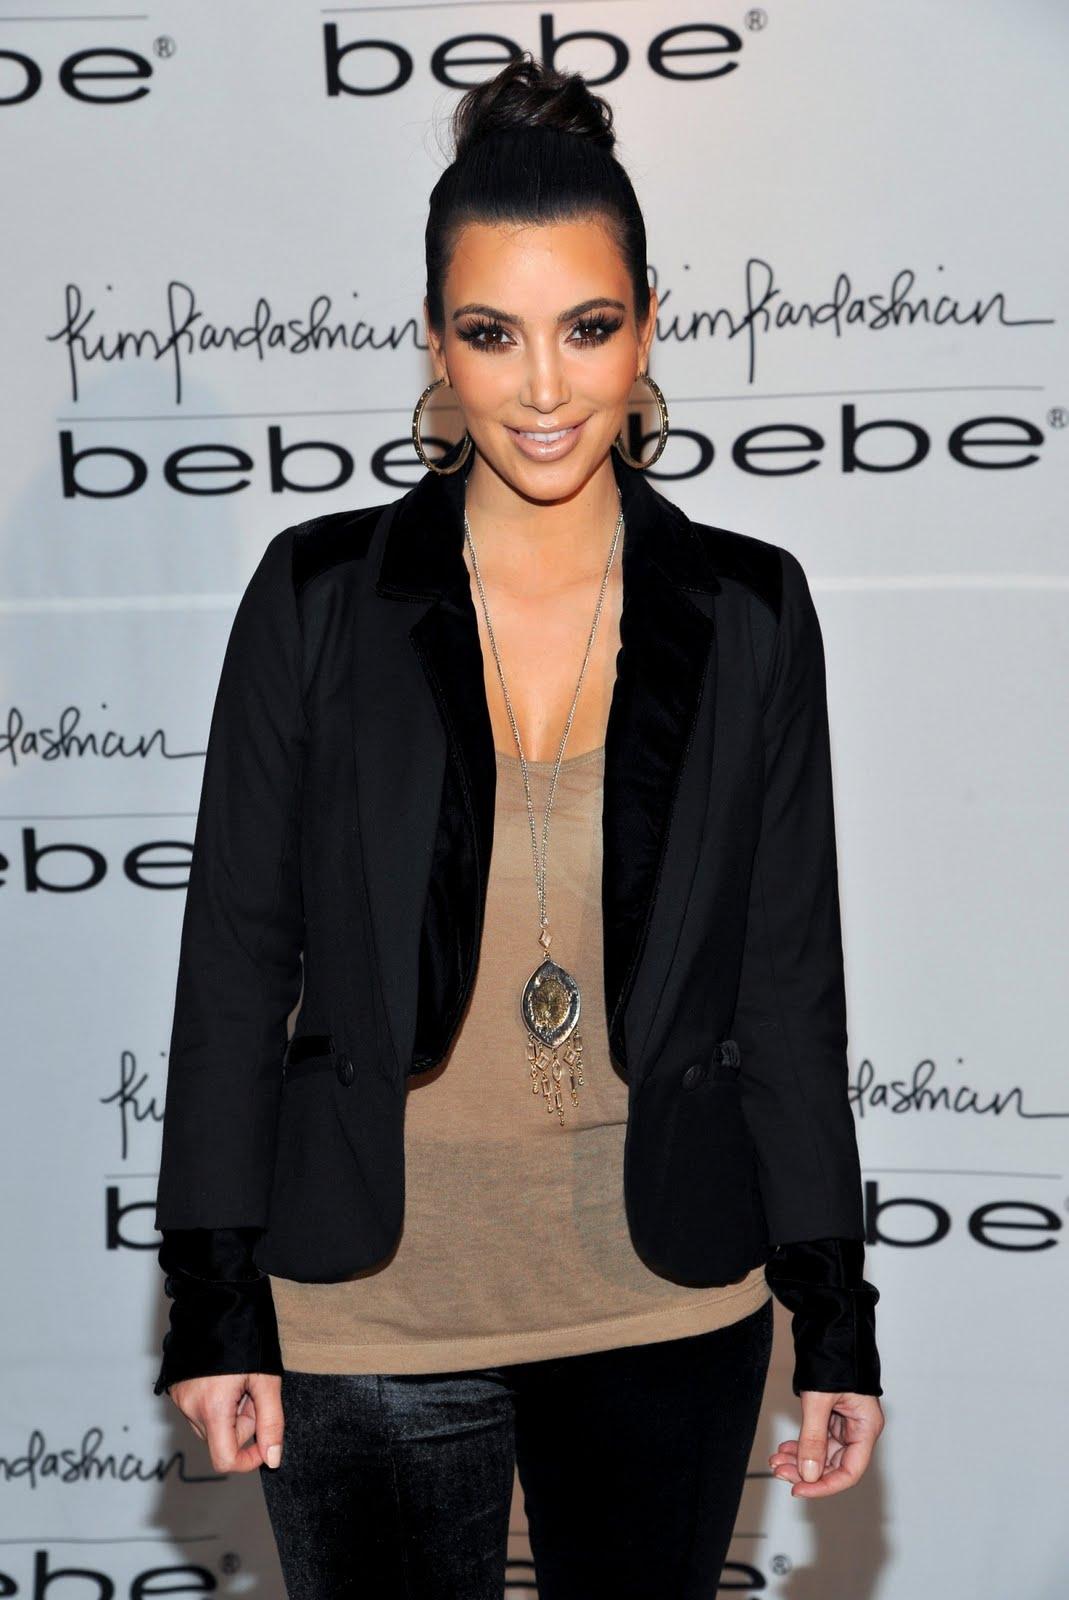 http://3.bp.blogspot.com/_Ca21XCsvg58/TP_eRyMO6RI/AAAAAAAACnc/gnXTxUiV6lI/s1600/kim-kardashian-02.jpg